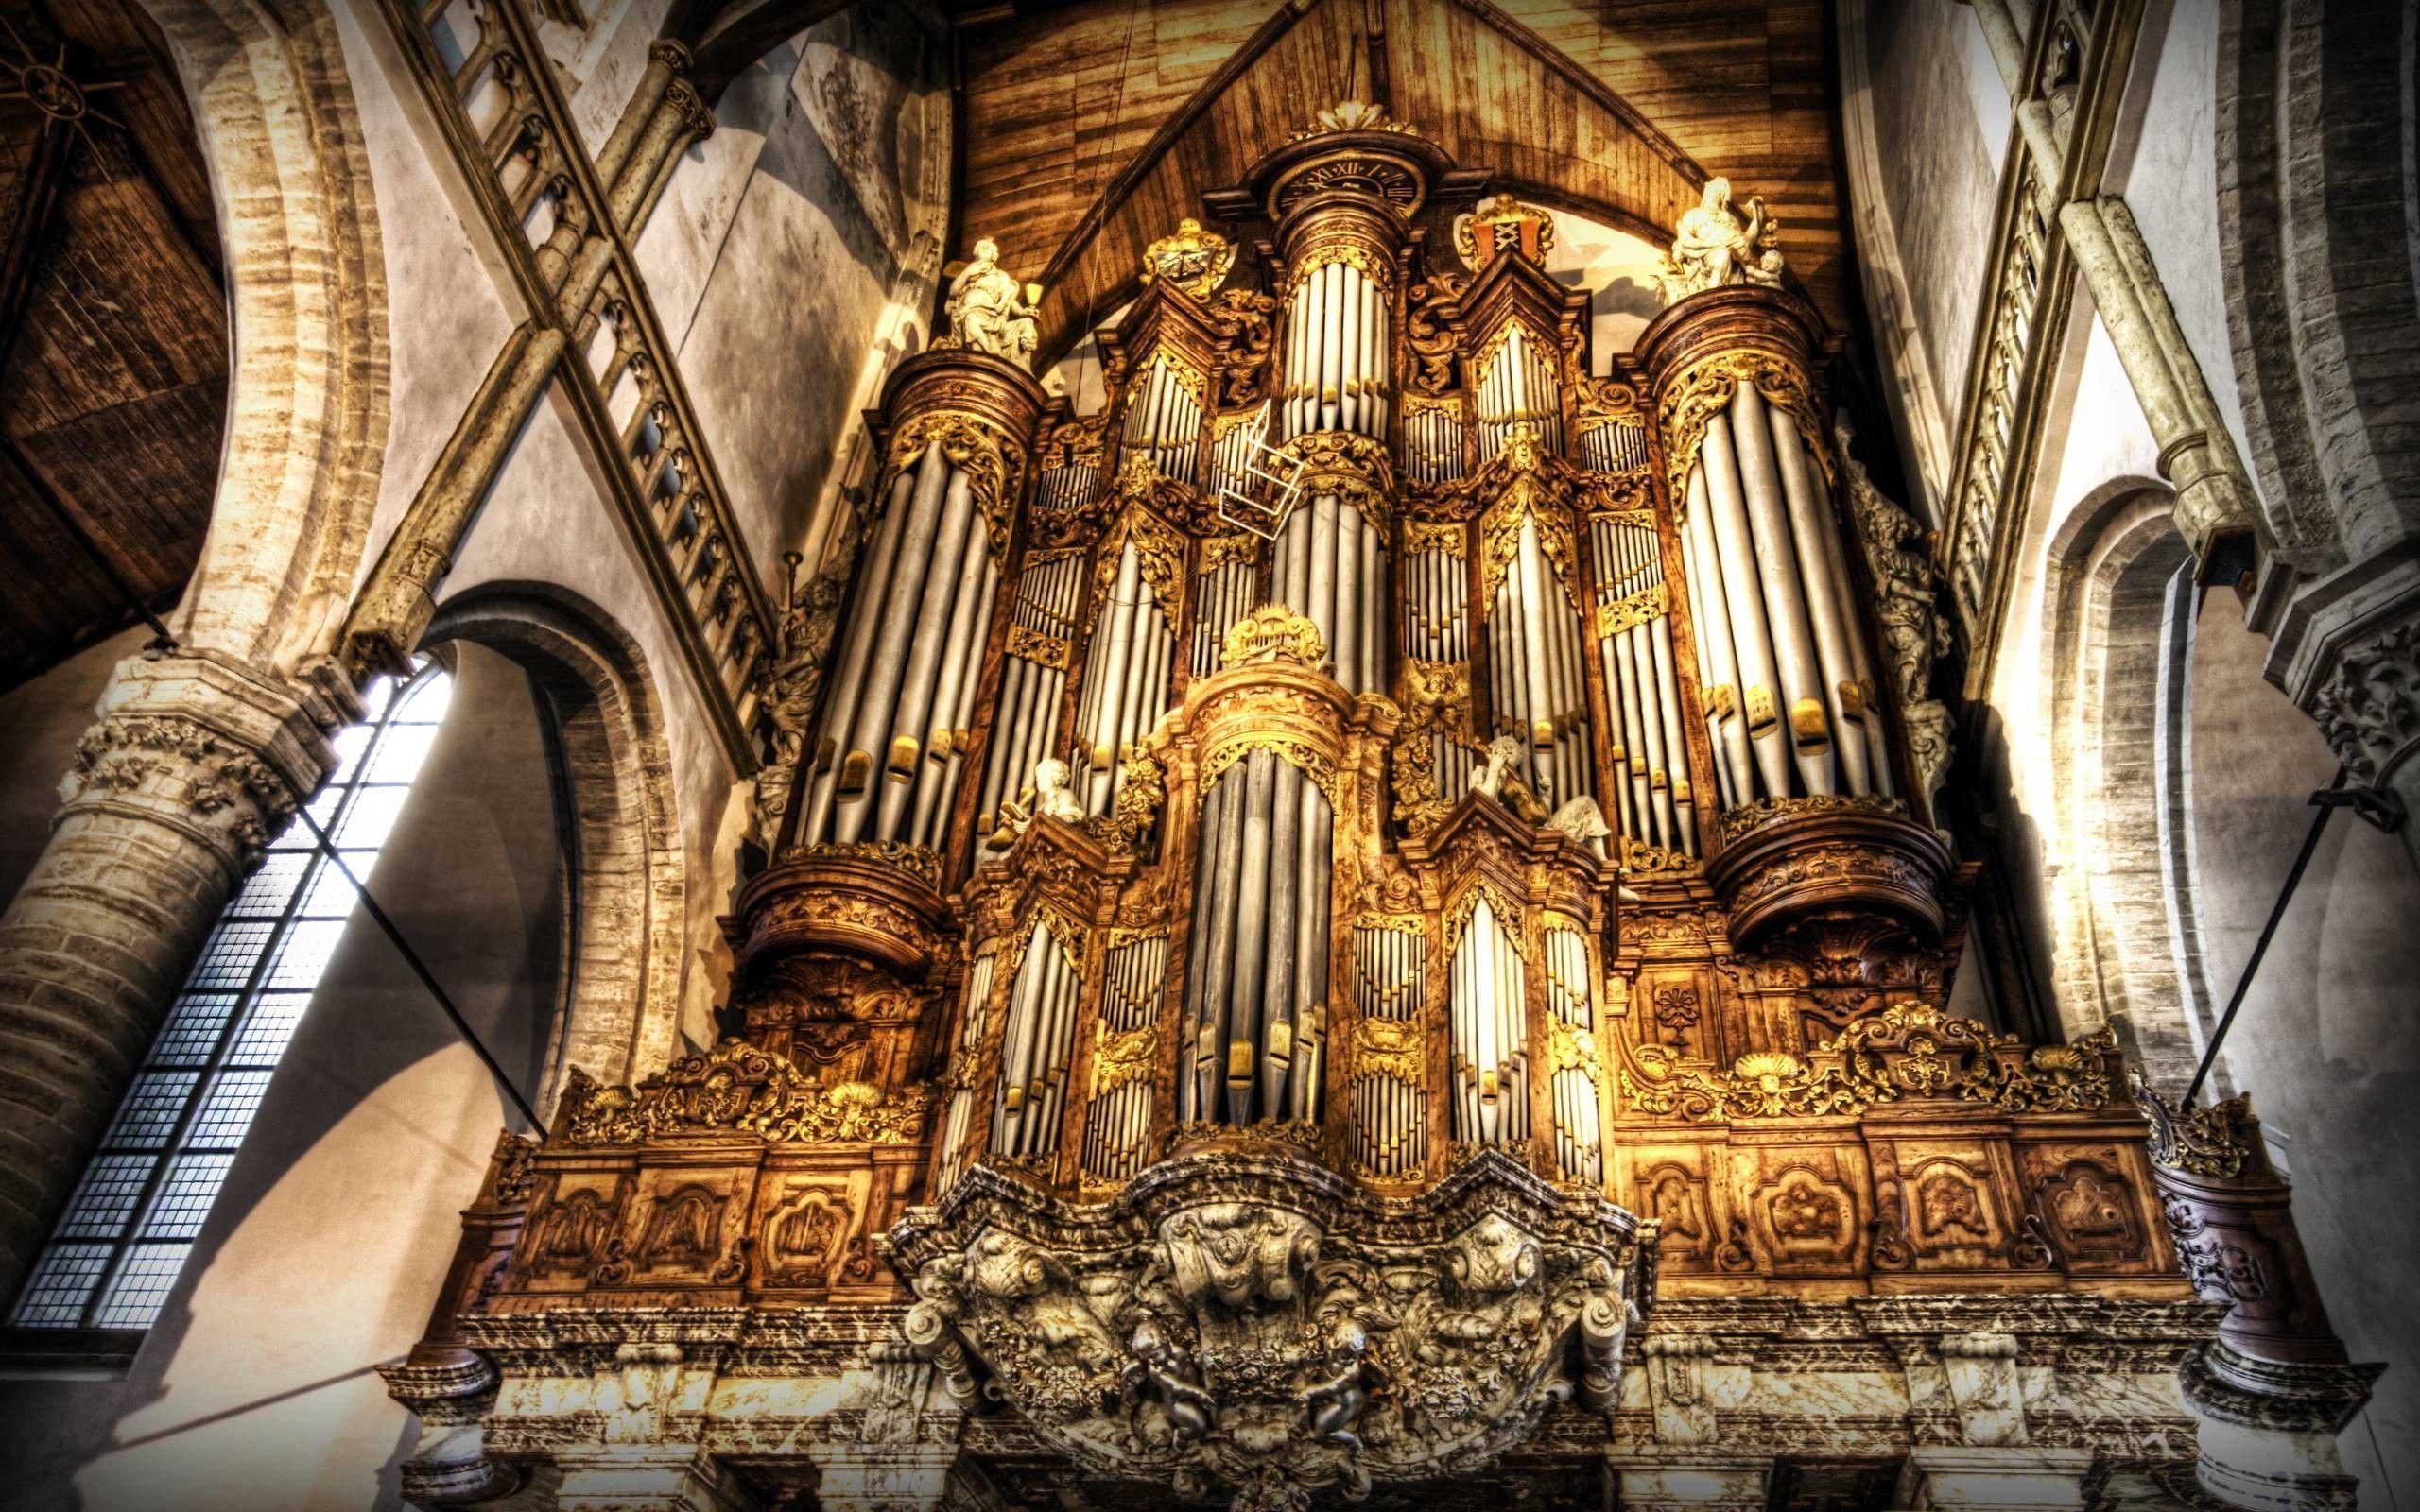 Pipe Organ Wallpapers   Top Free Pipe Organ Backgrounds ...